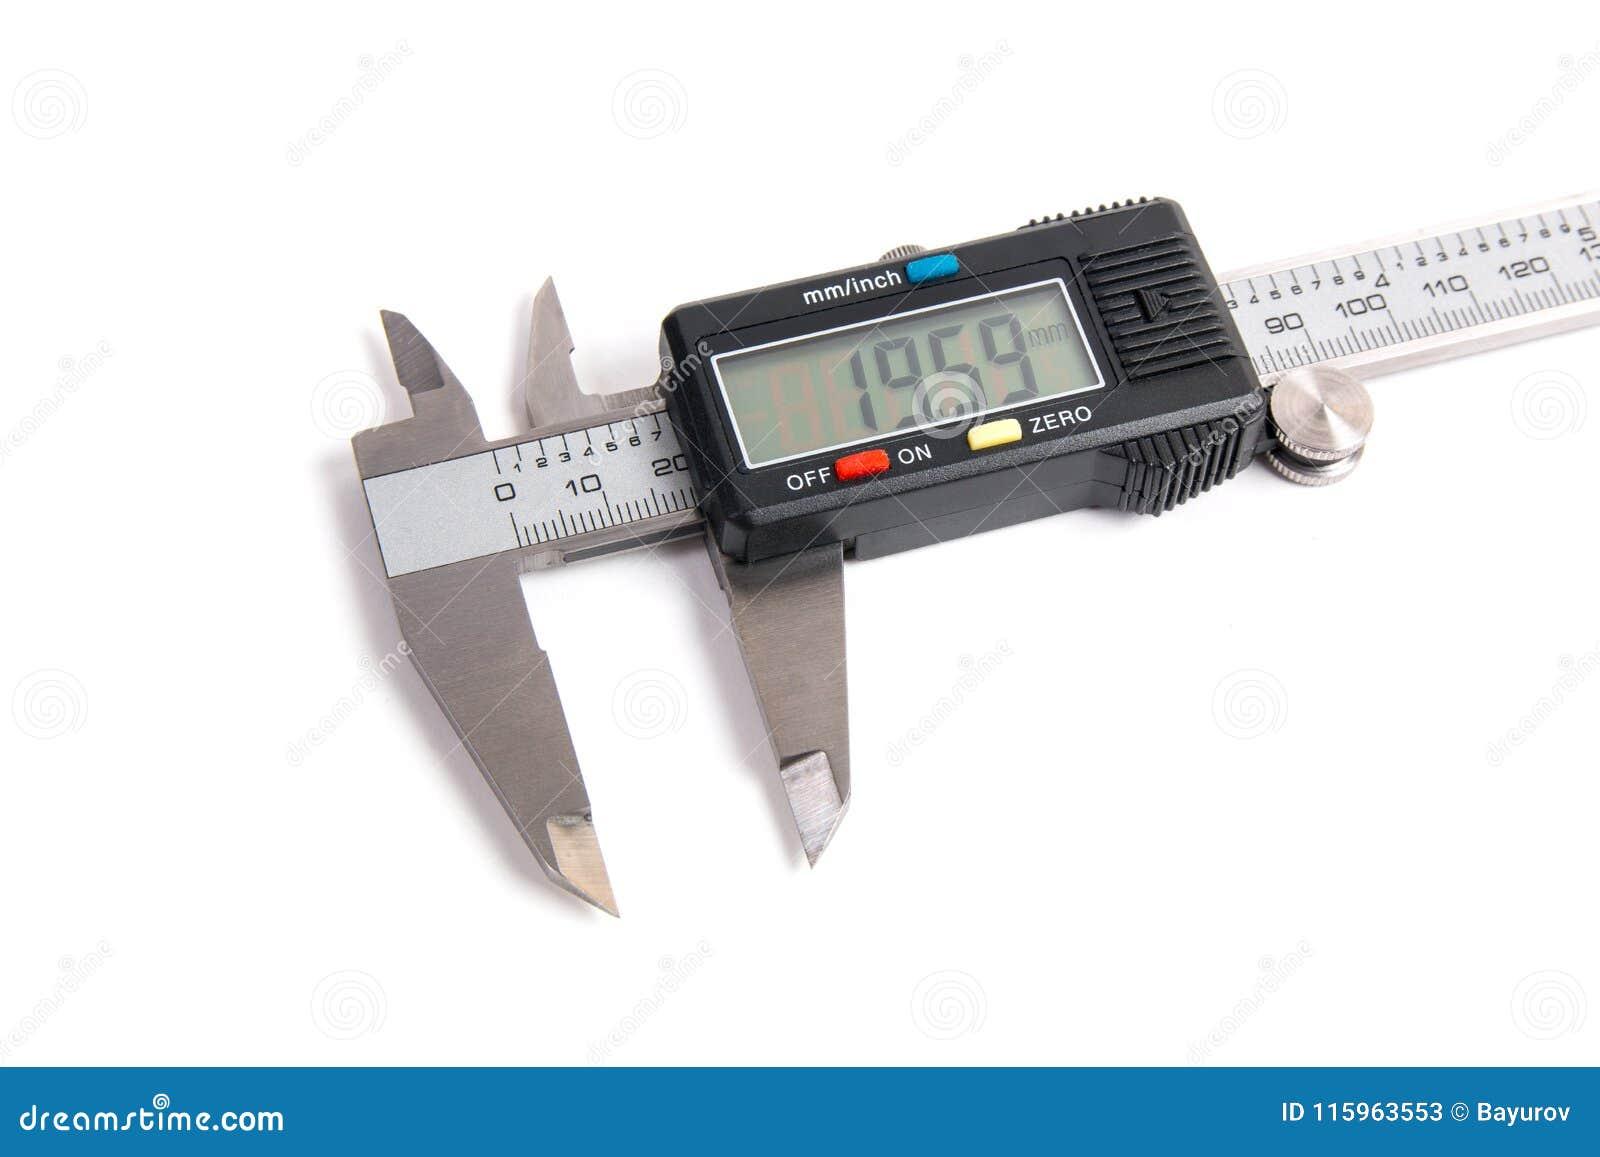 Electronic digital caliper on white background